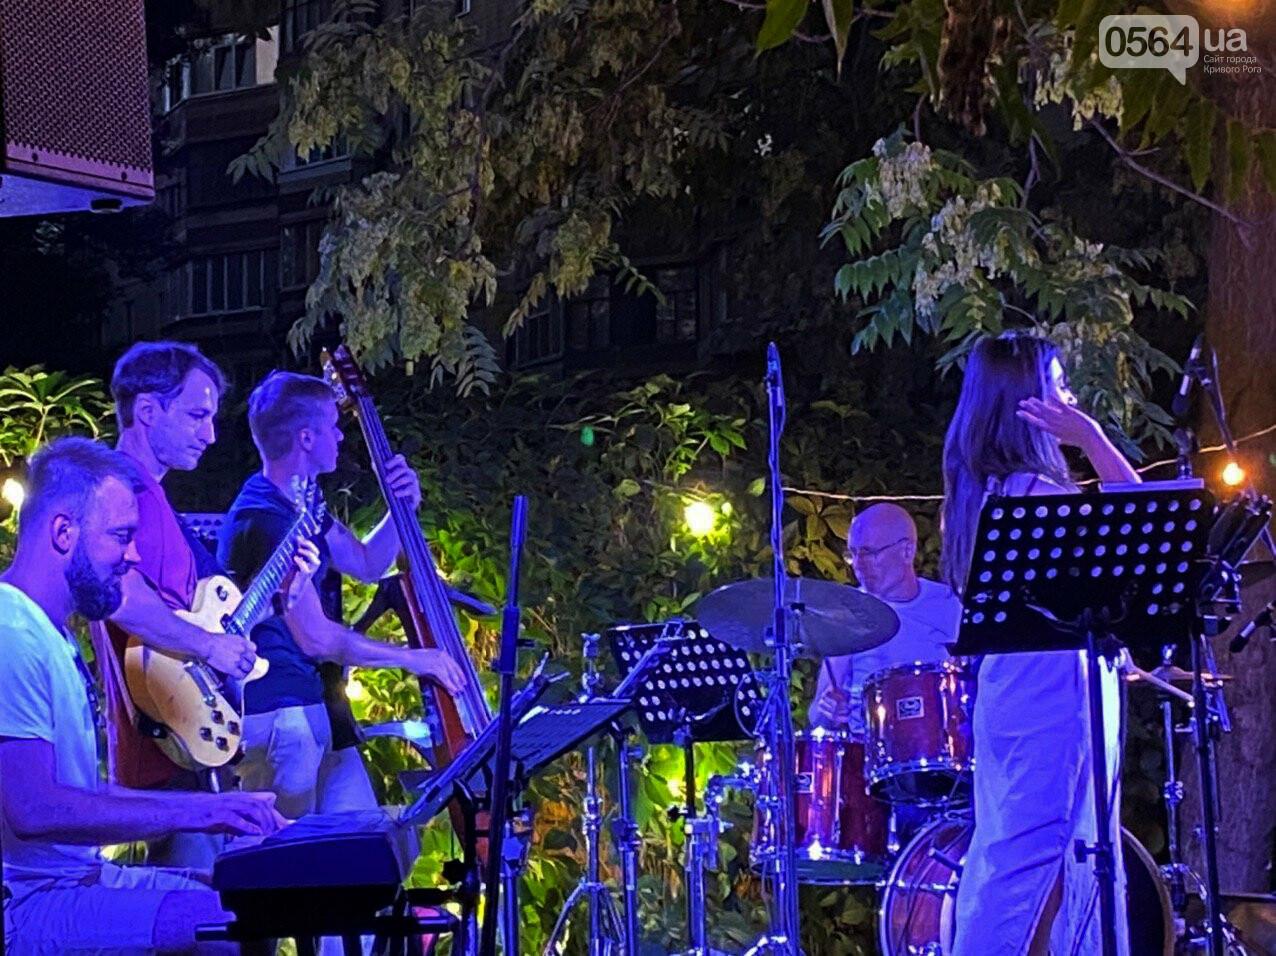 Под звездным небом криворожане наслаждались летним джазом от  Advantage Project, - ФОТО, ВИДЕО , фото-53